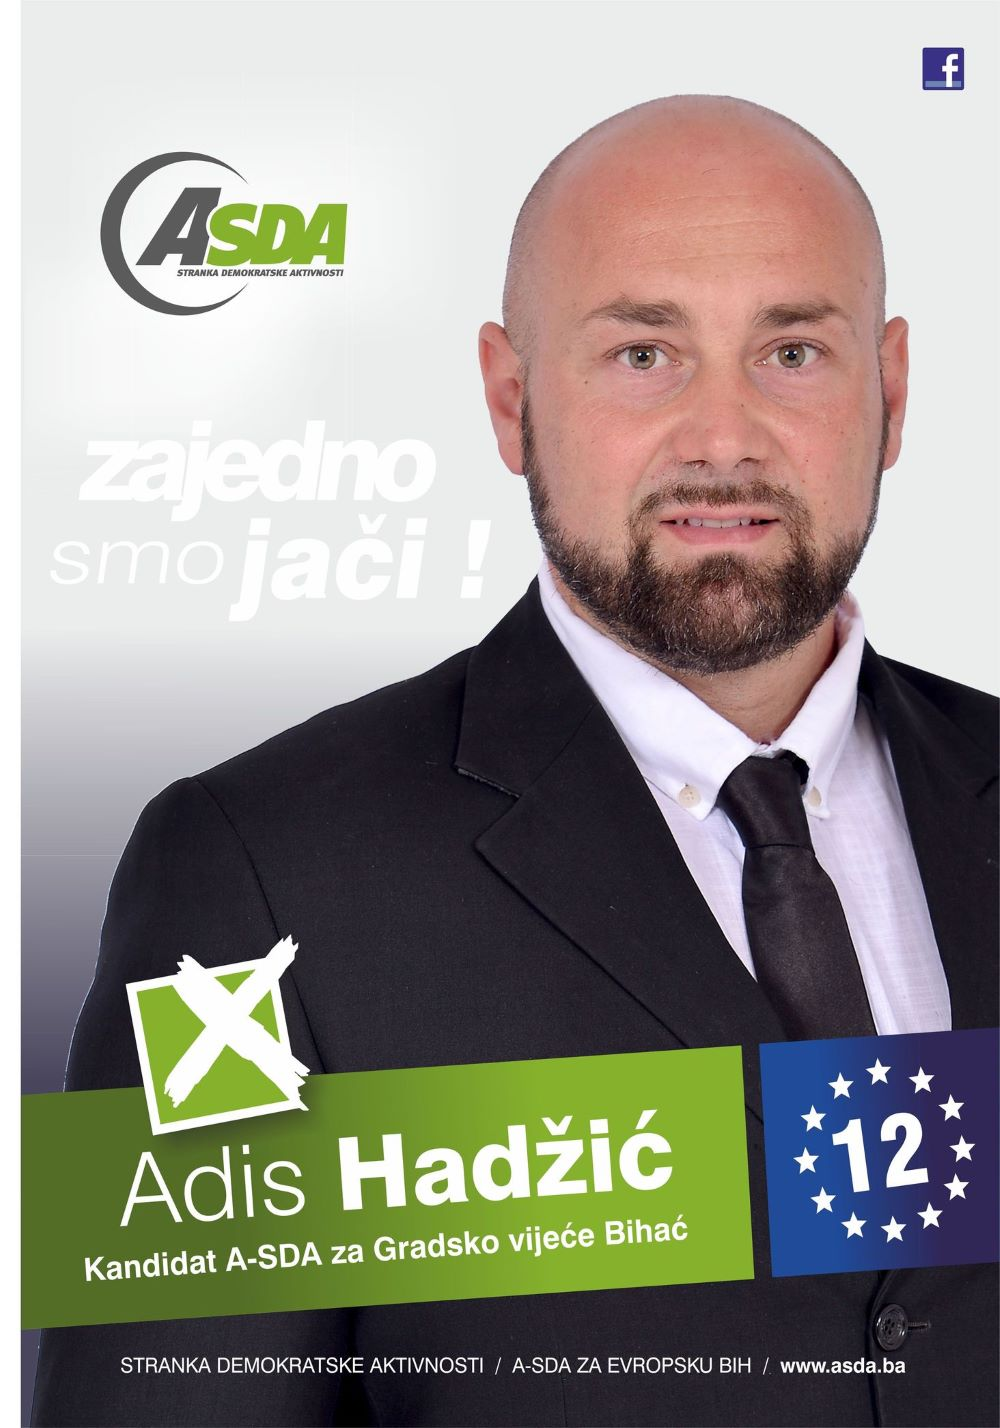 Adis Hadžić